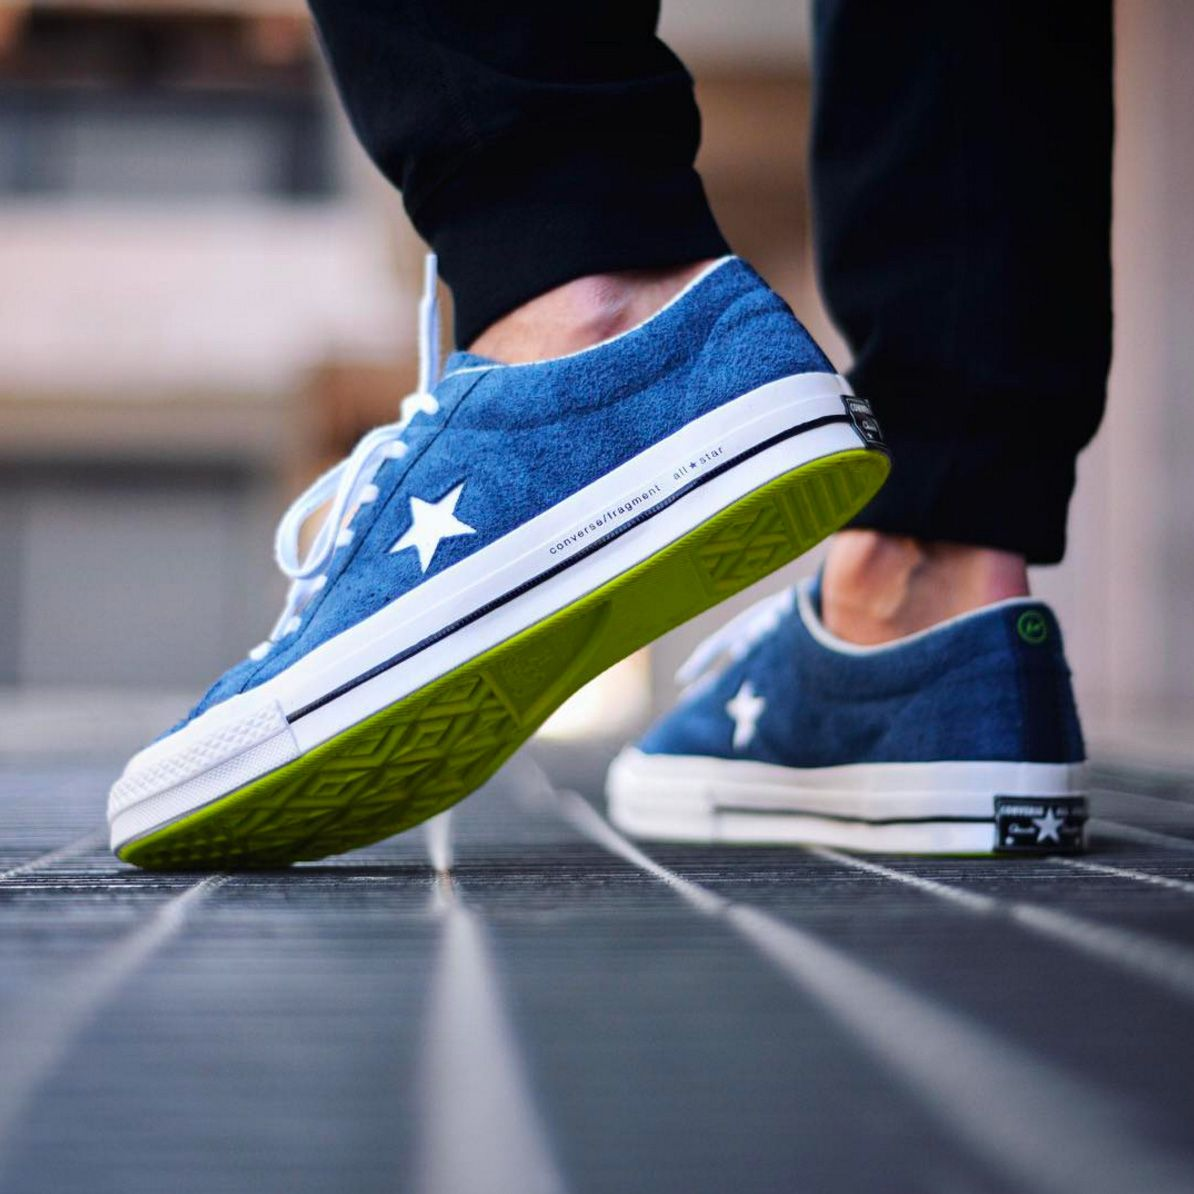 Converse One Star 19